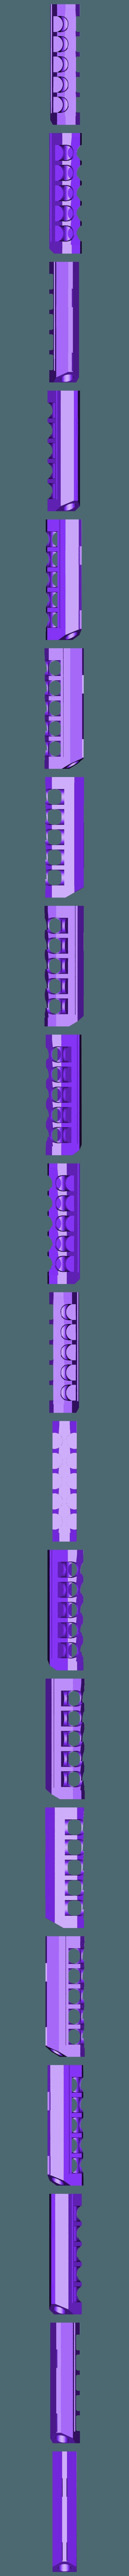 STL_S5_v20_Barell_Cover_.stl Download free STL file Star Wars Naboo S5 Heavy Blaster Pistol • 3D printing design, Dsk